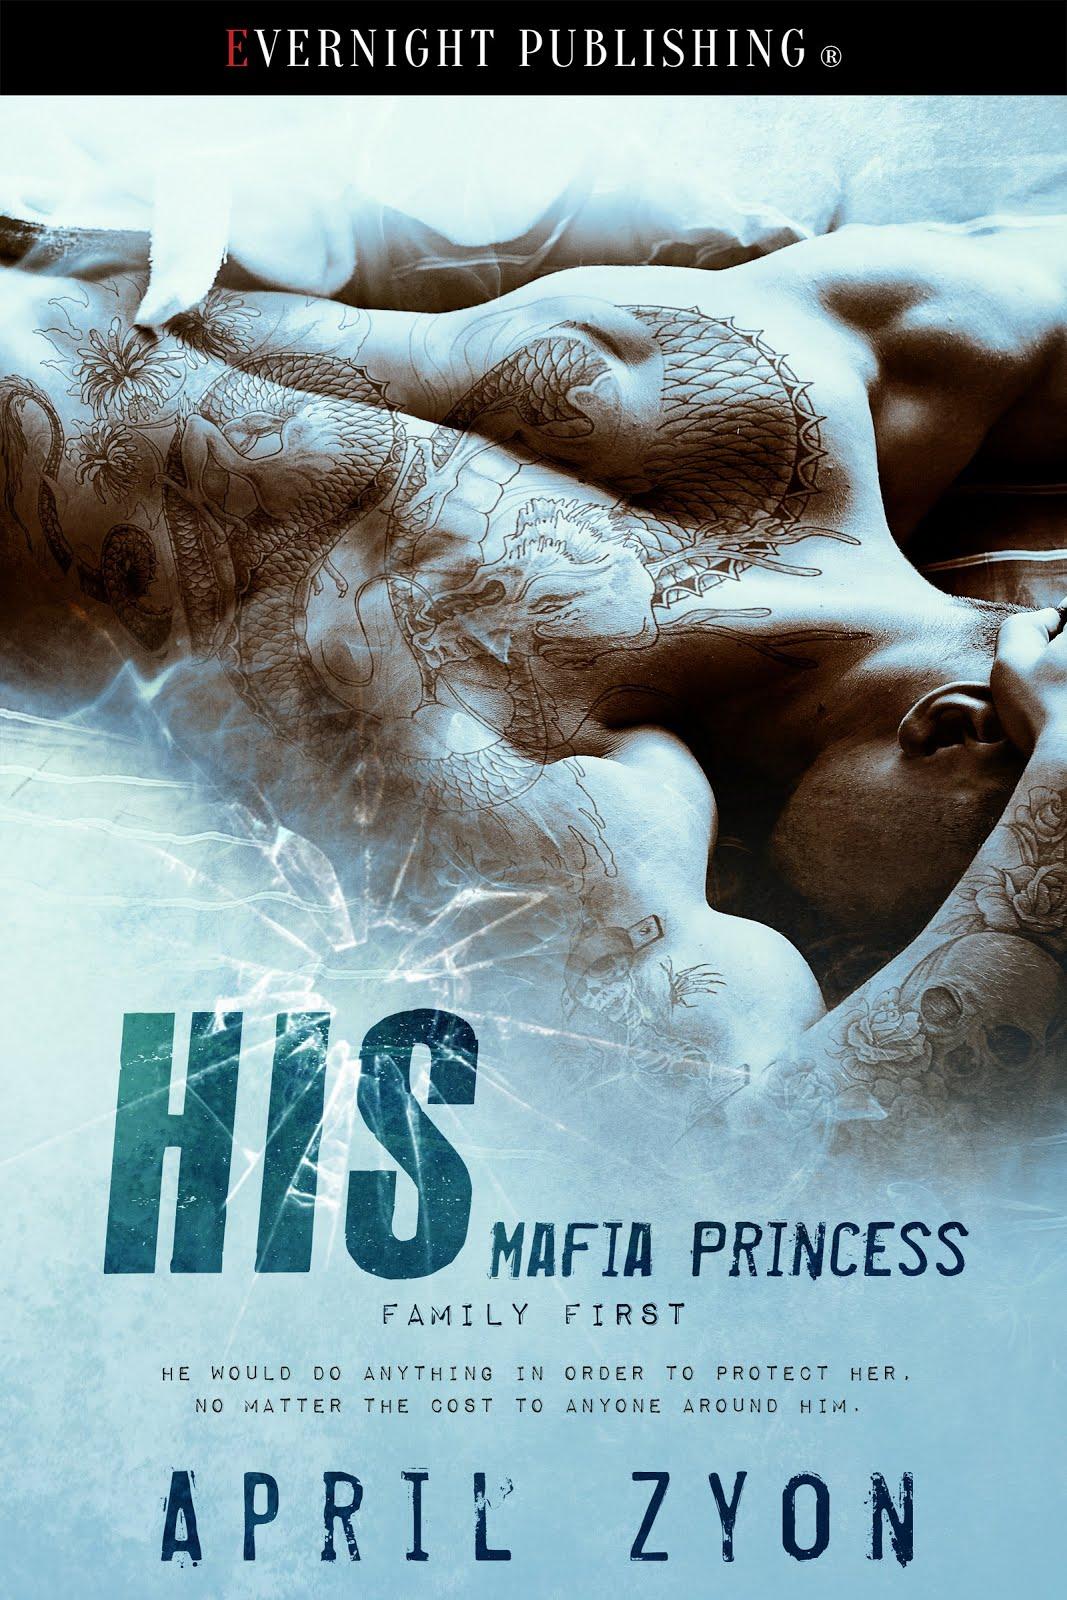 His Mafia Princess